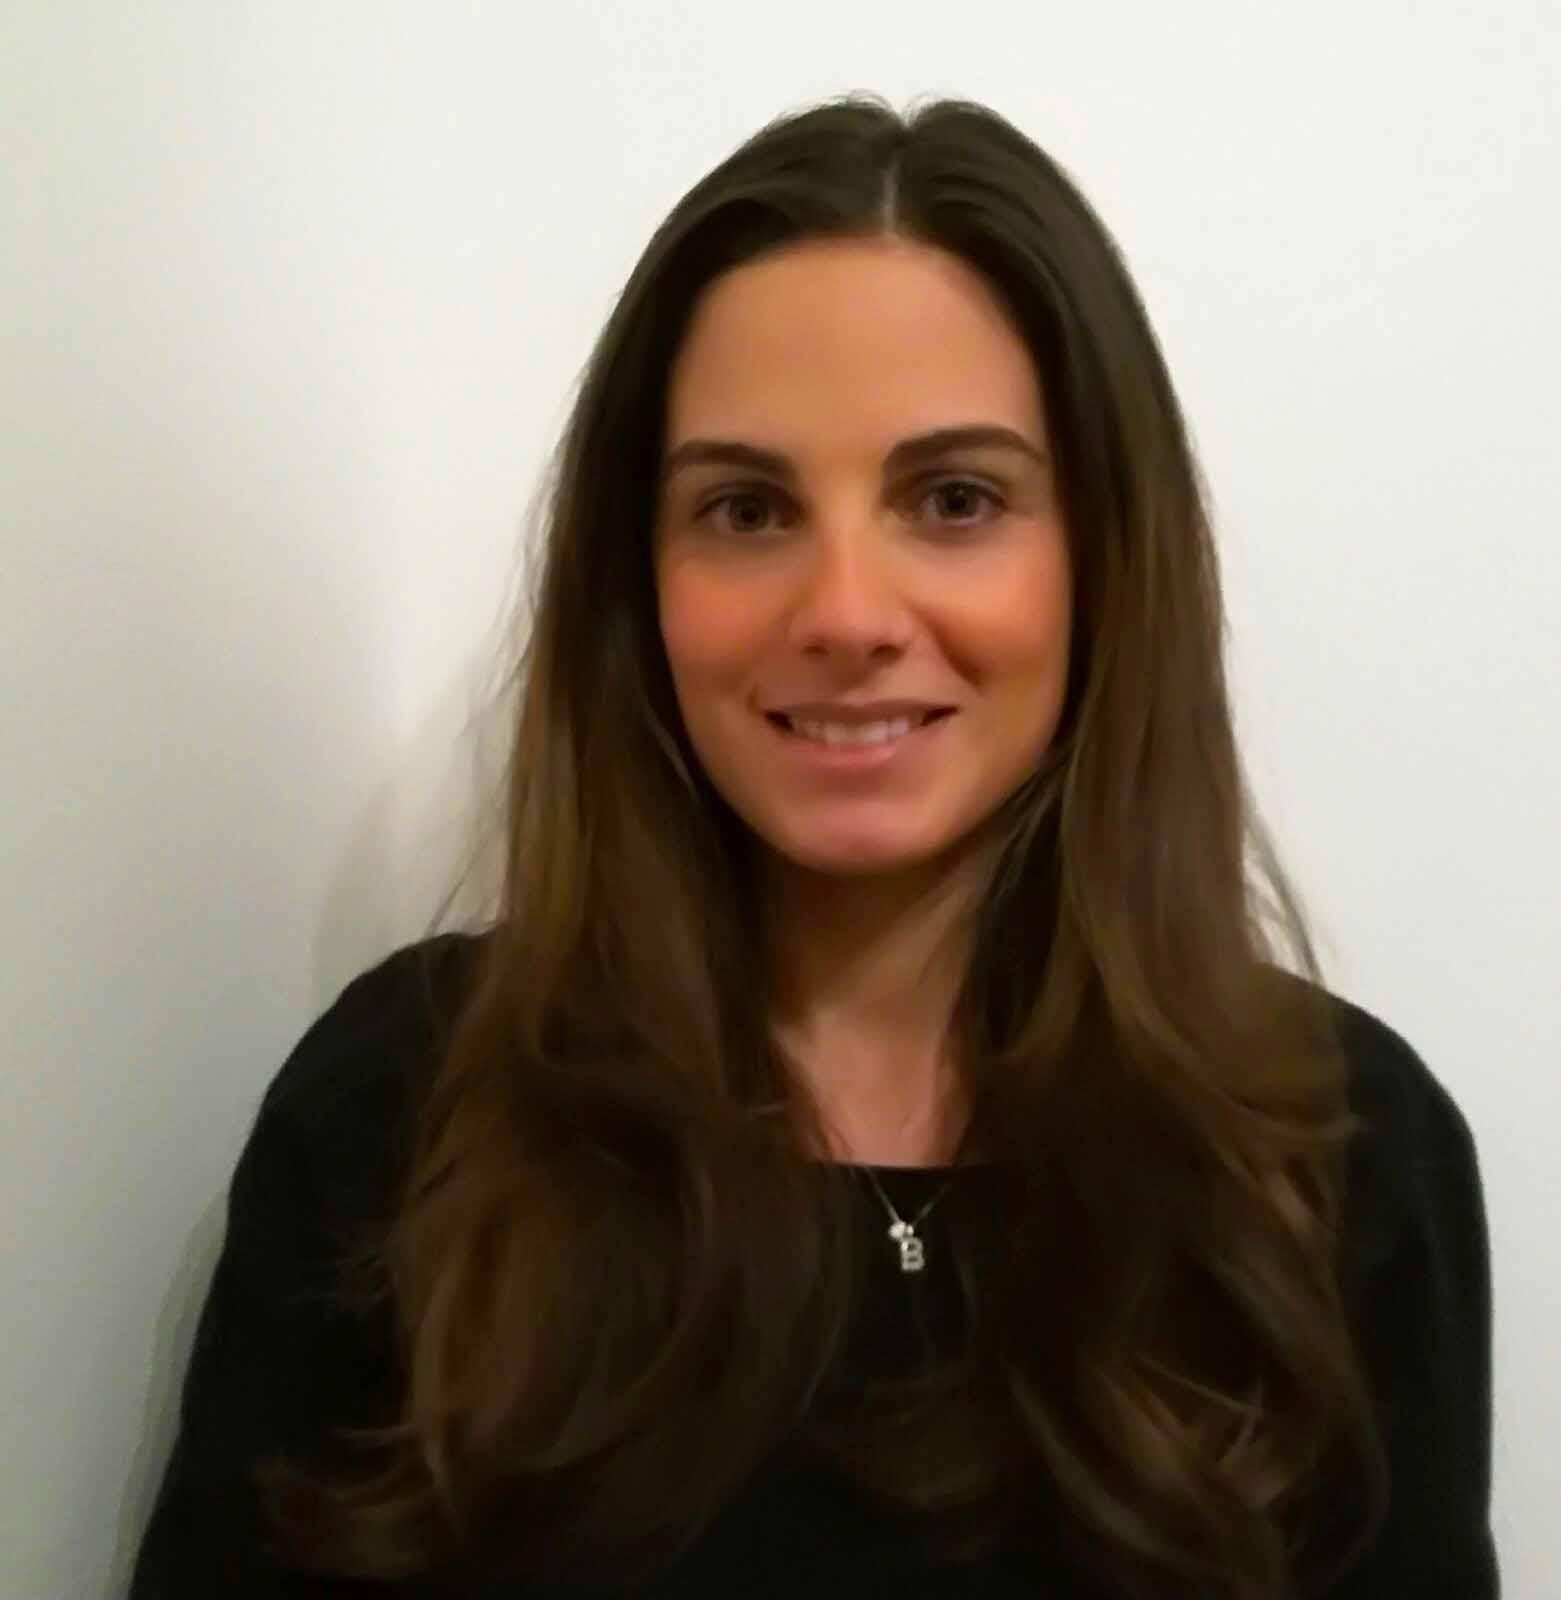 Alessandra Bisconti